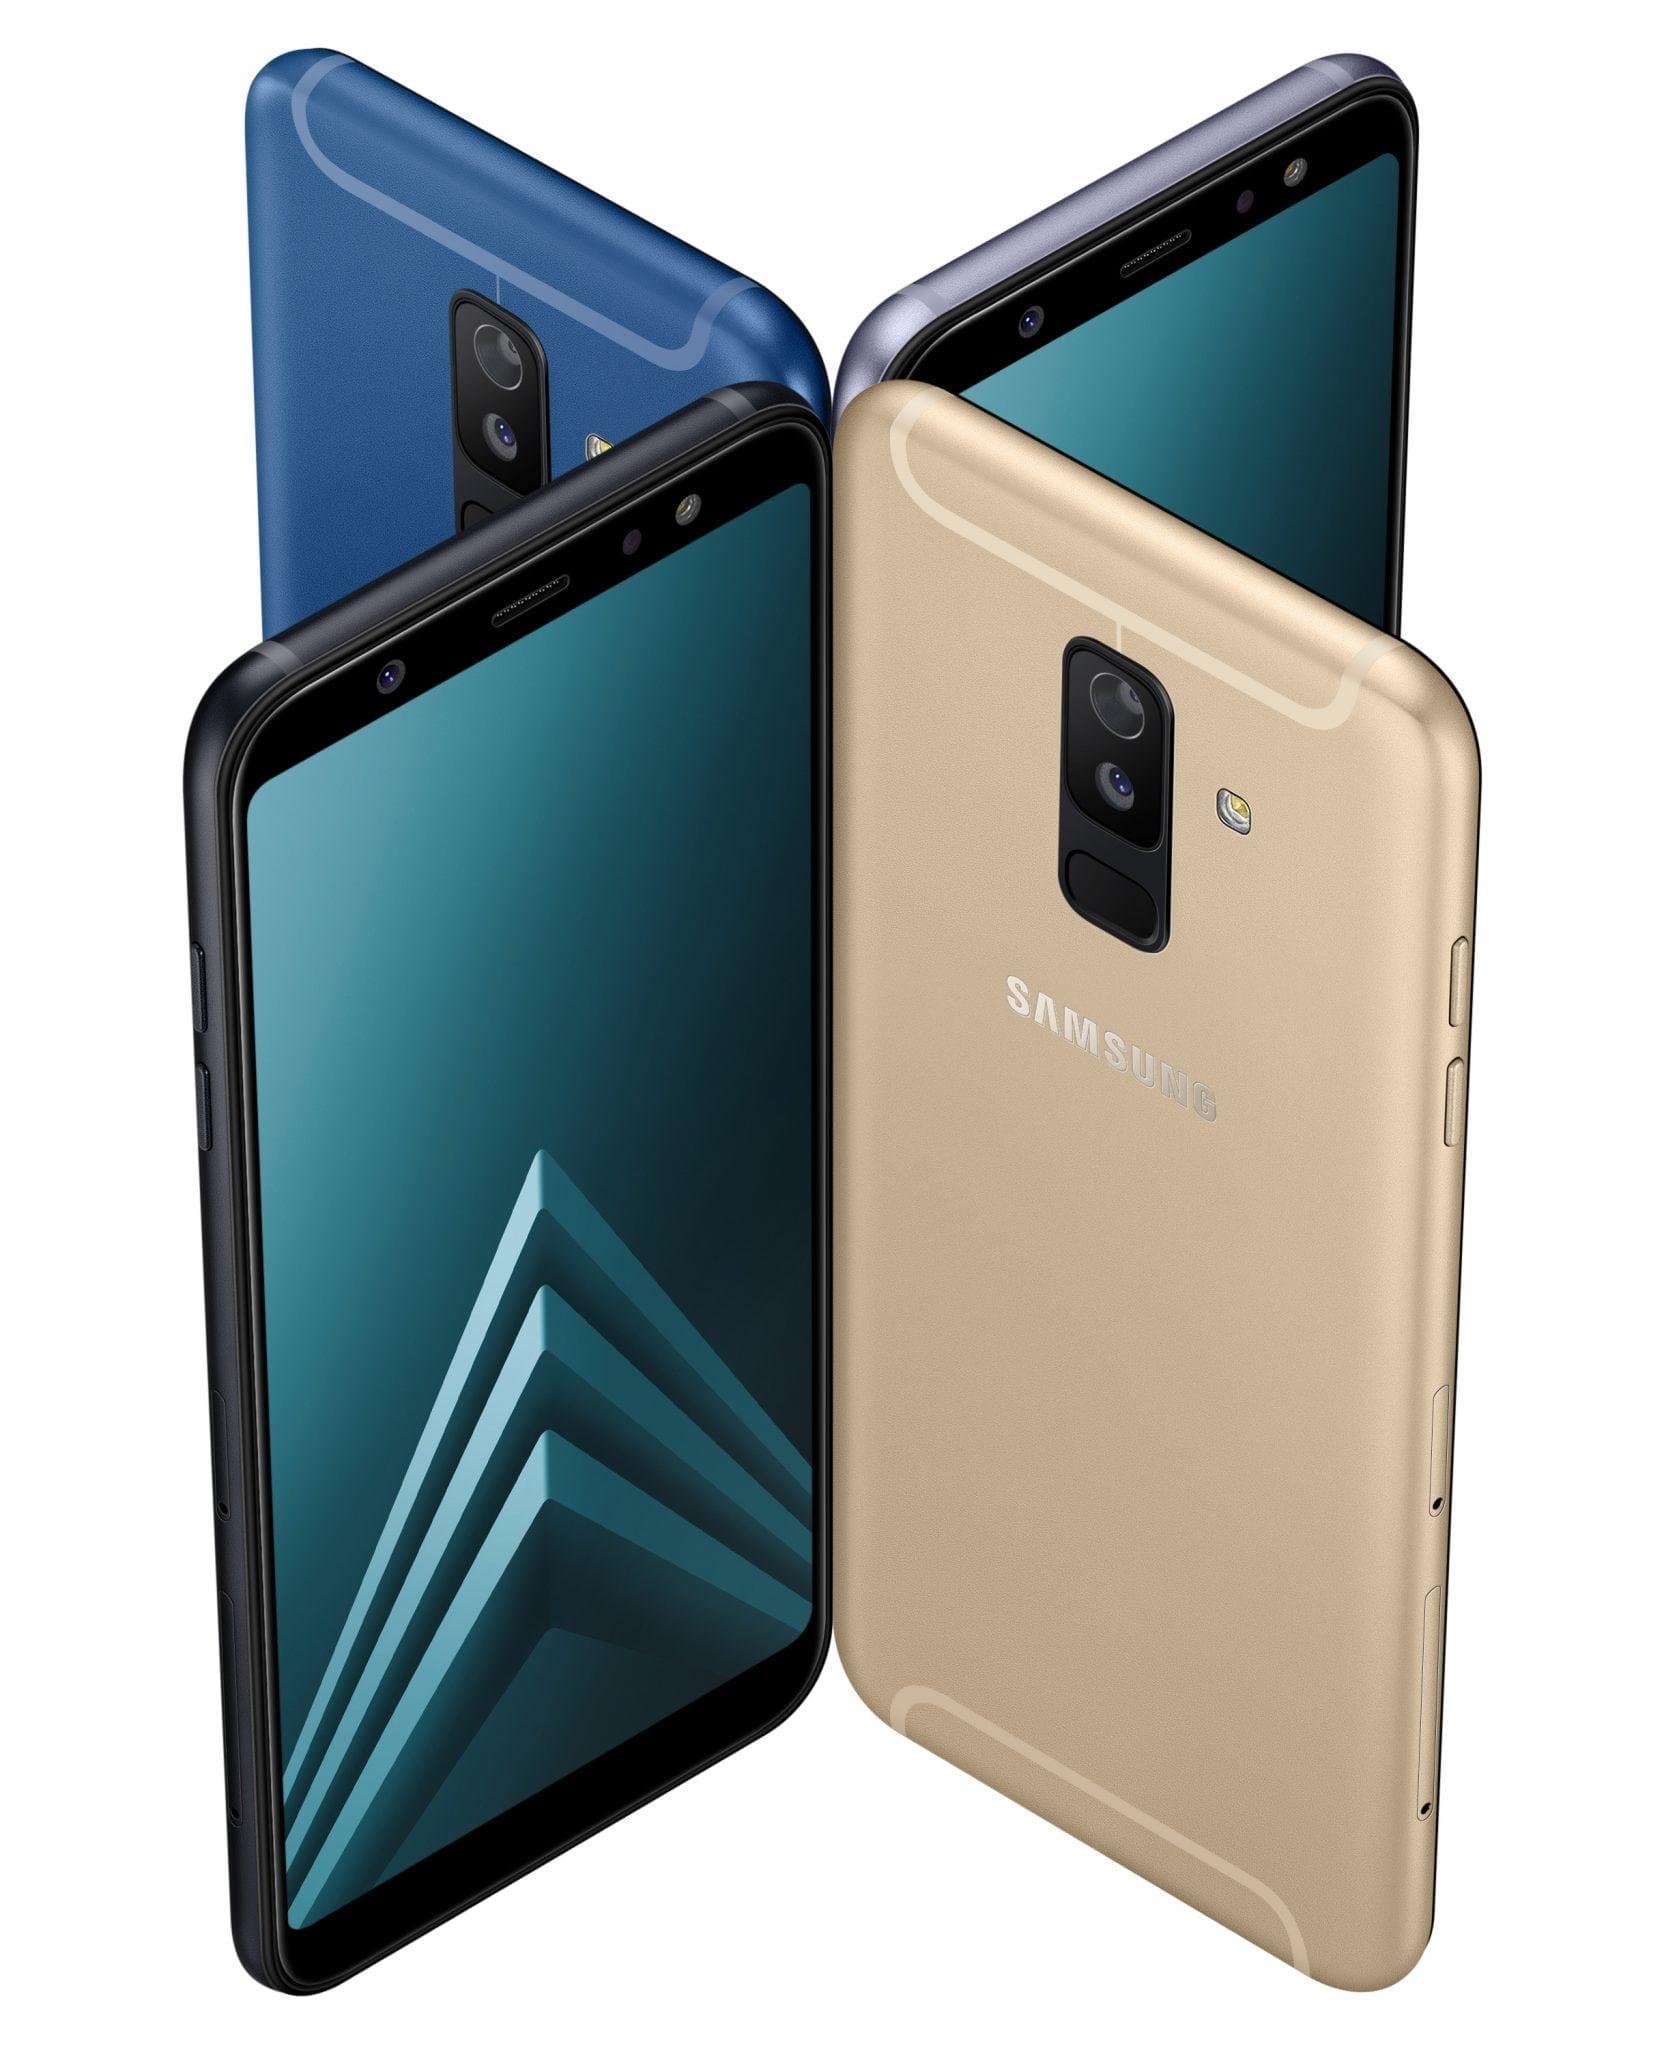 Samsung prezintă local noile Galaxy A6 și A6+